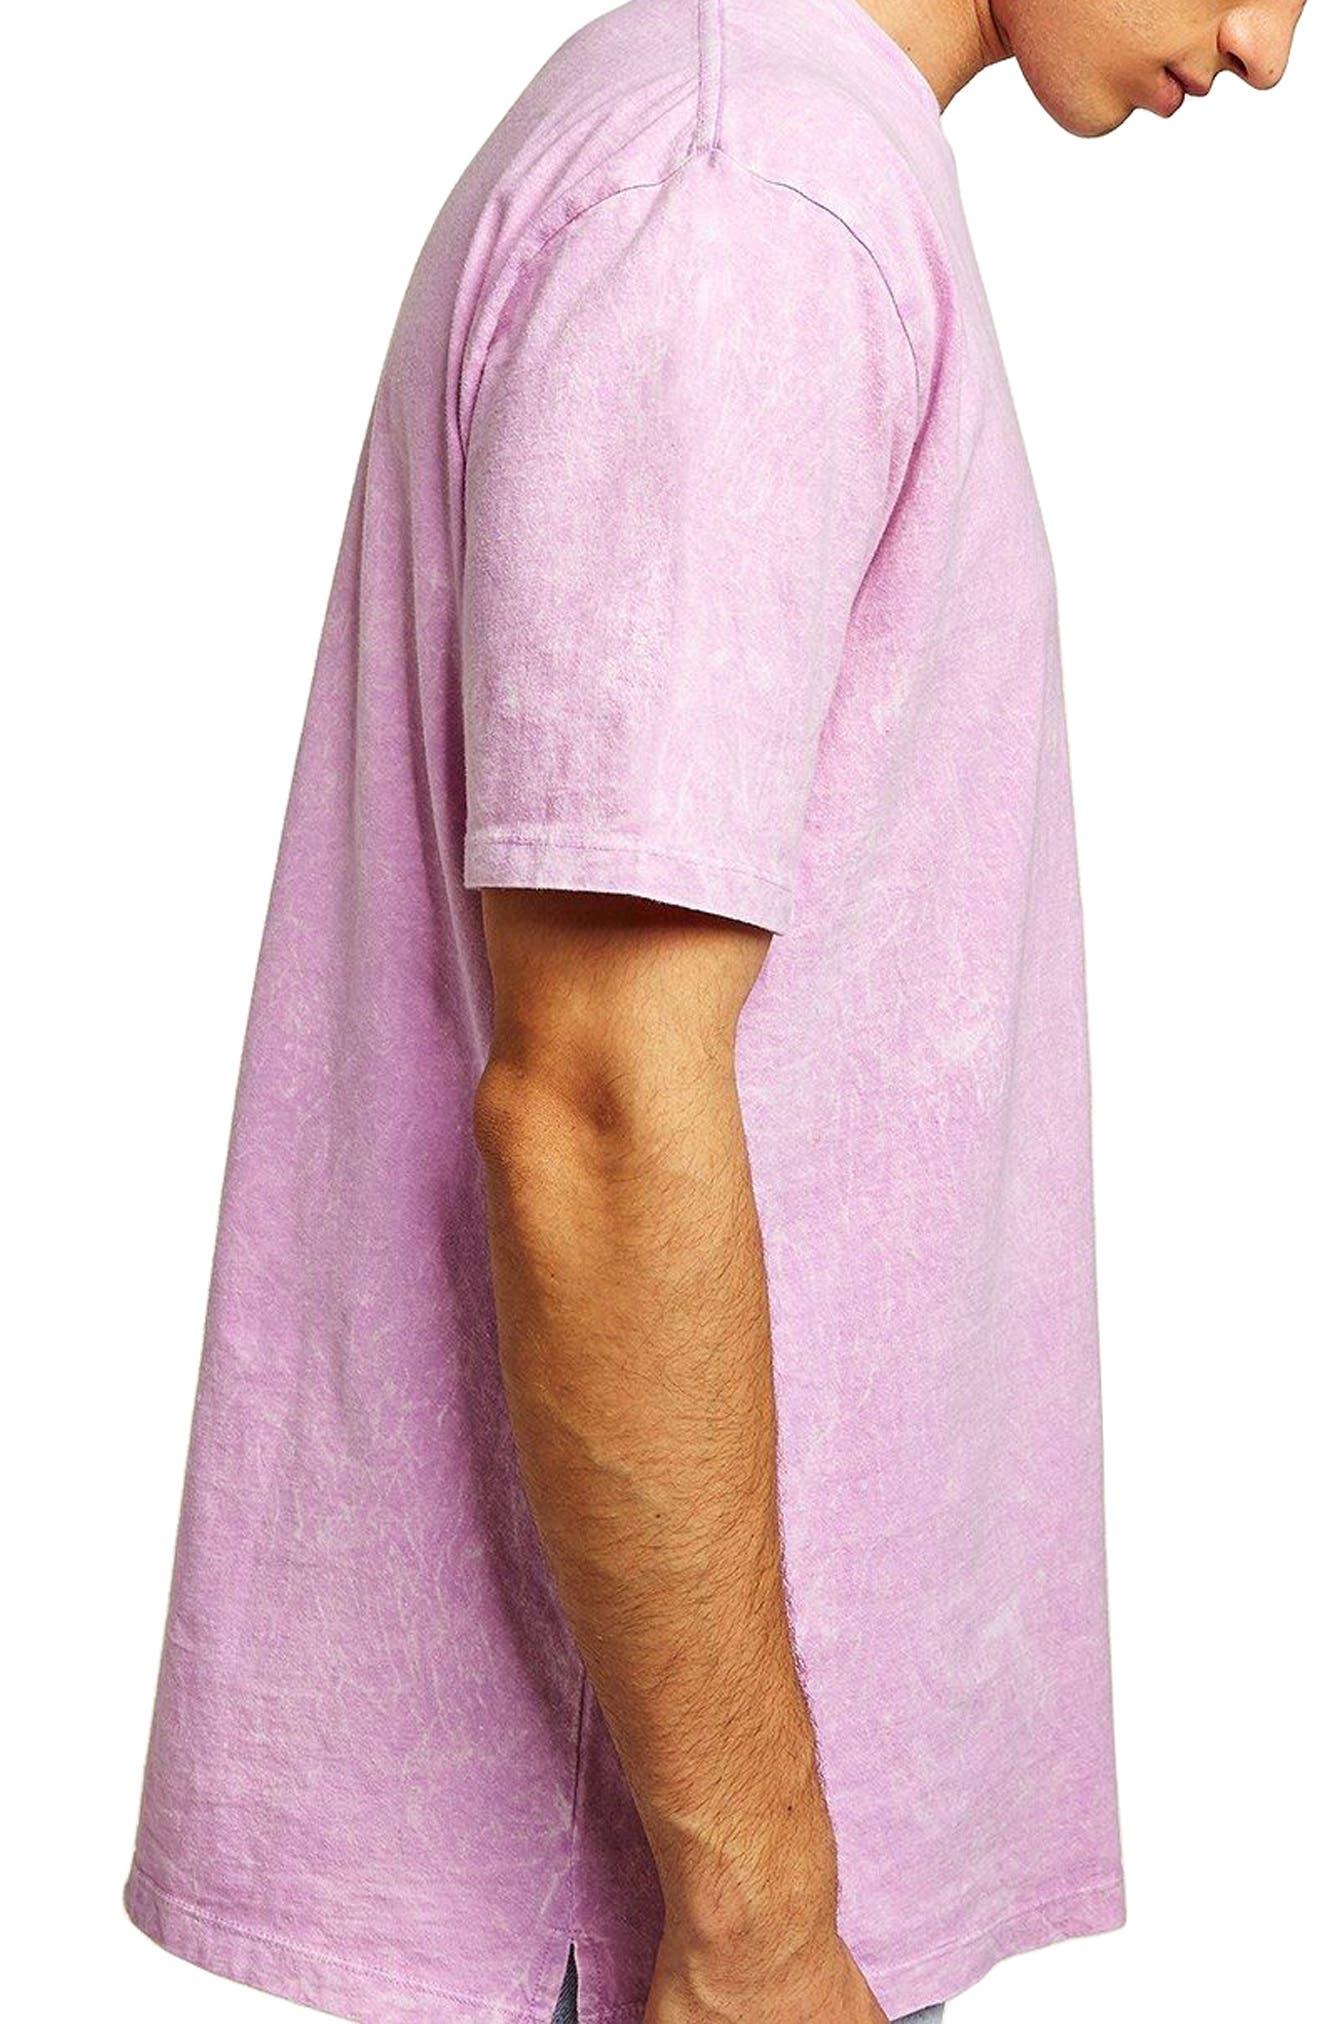 Acid Wash Pocket T-Shirt,                             Alternate thumbnail 2, color,                             650